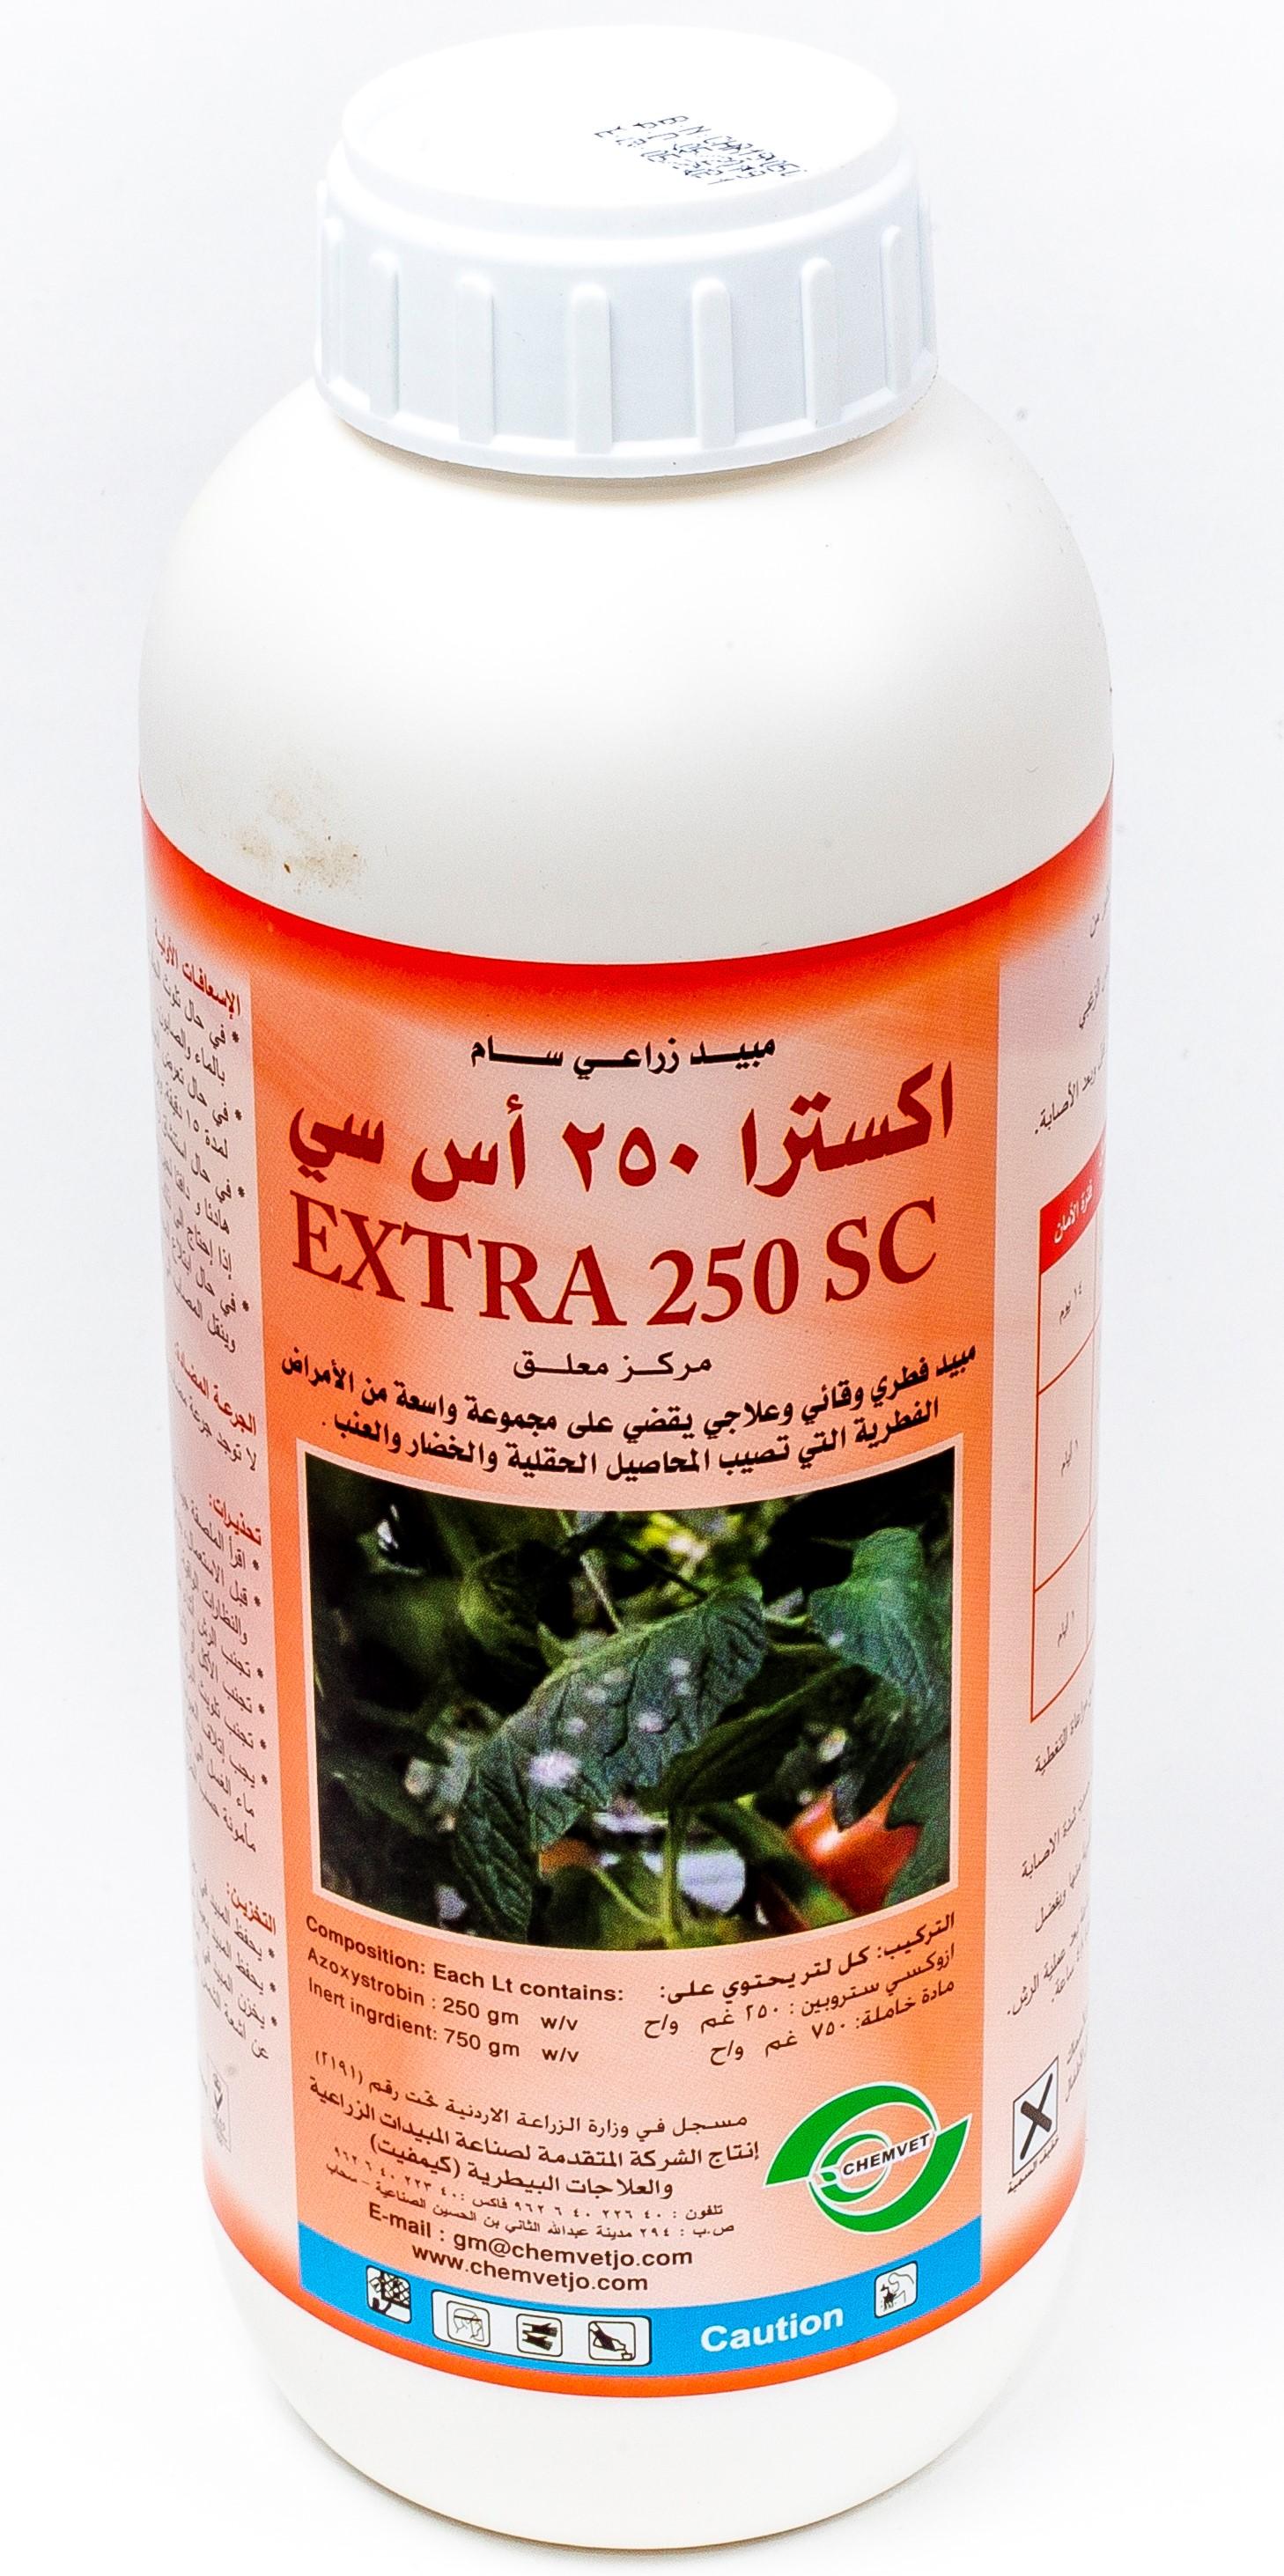 Extra 250 SC